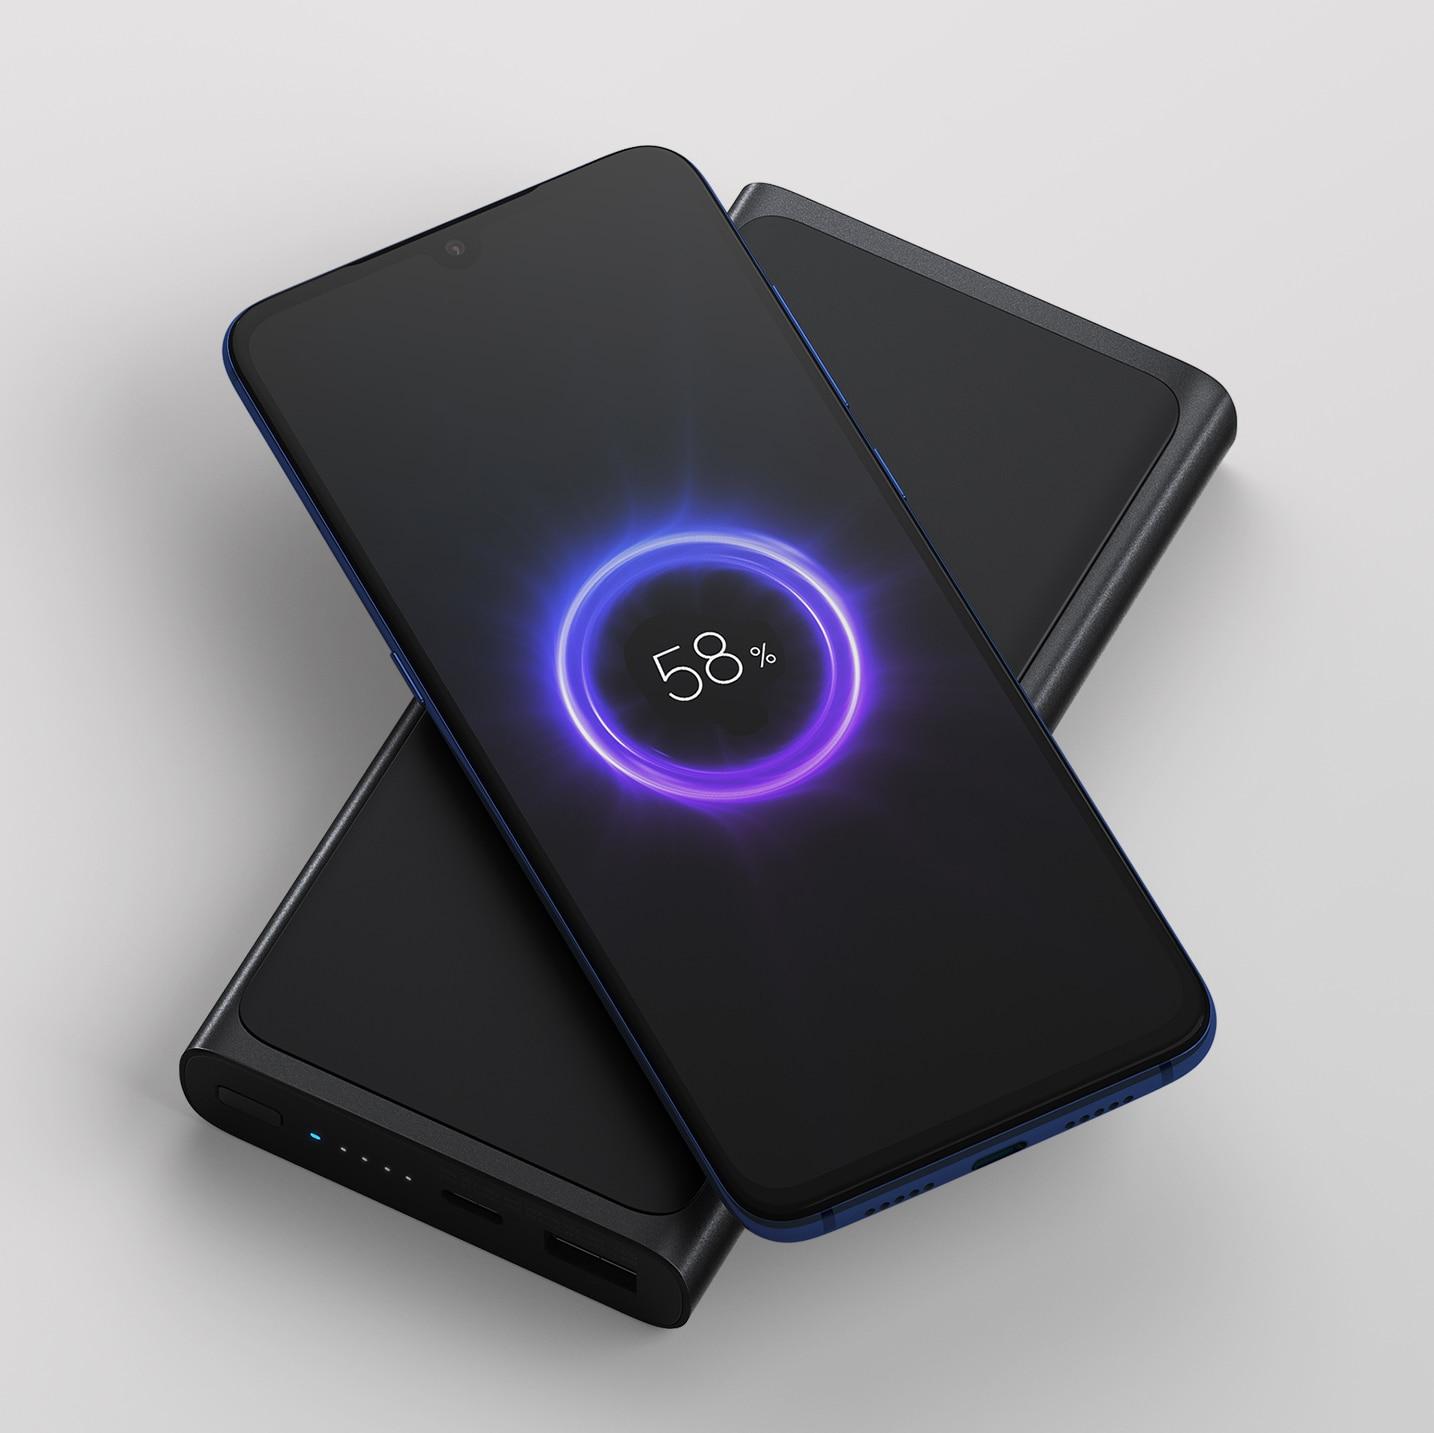 10000mAh QI Wireless Charging